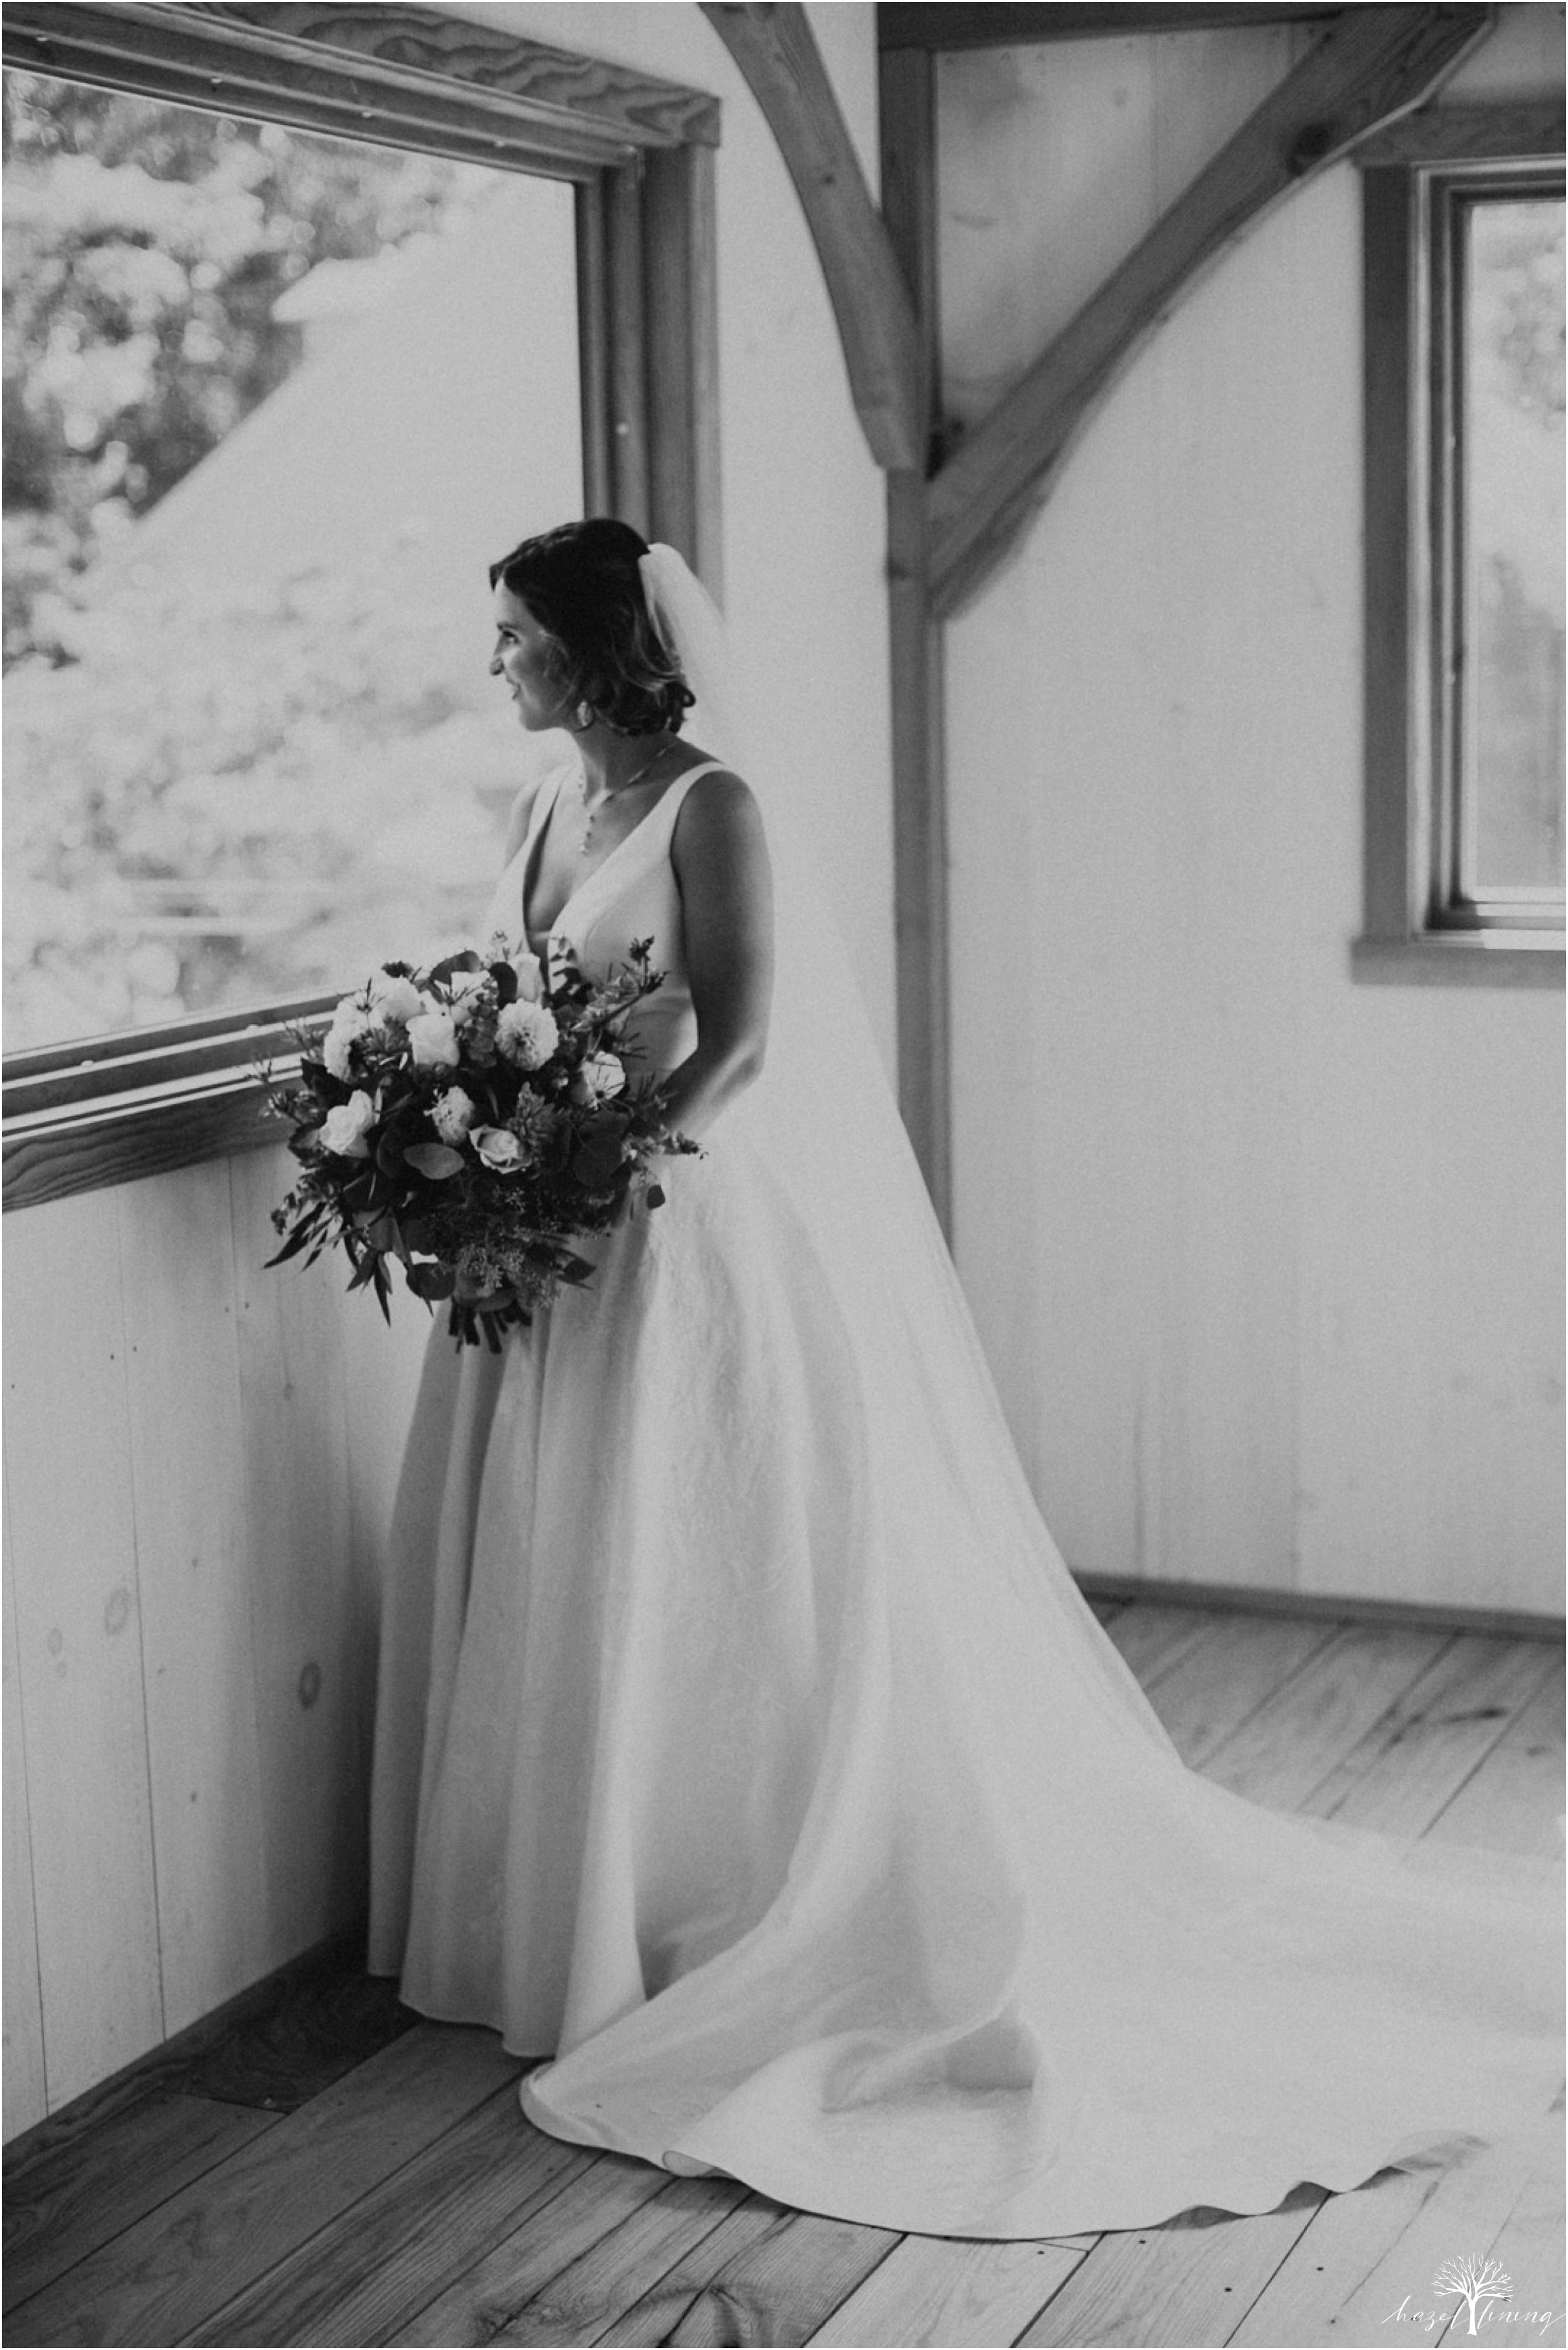 maureen-hepner-anthony-giordano-rose-bank-winery-newtow-pennsylvania-luxury-summer-wedding-hazel-lining-photography-destination-elopement-wedding-engagement-photography_0025.jpg